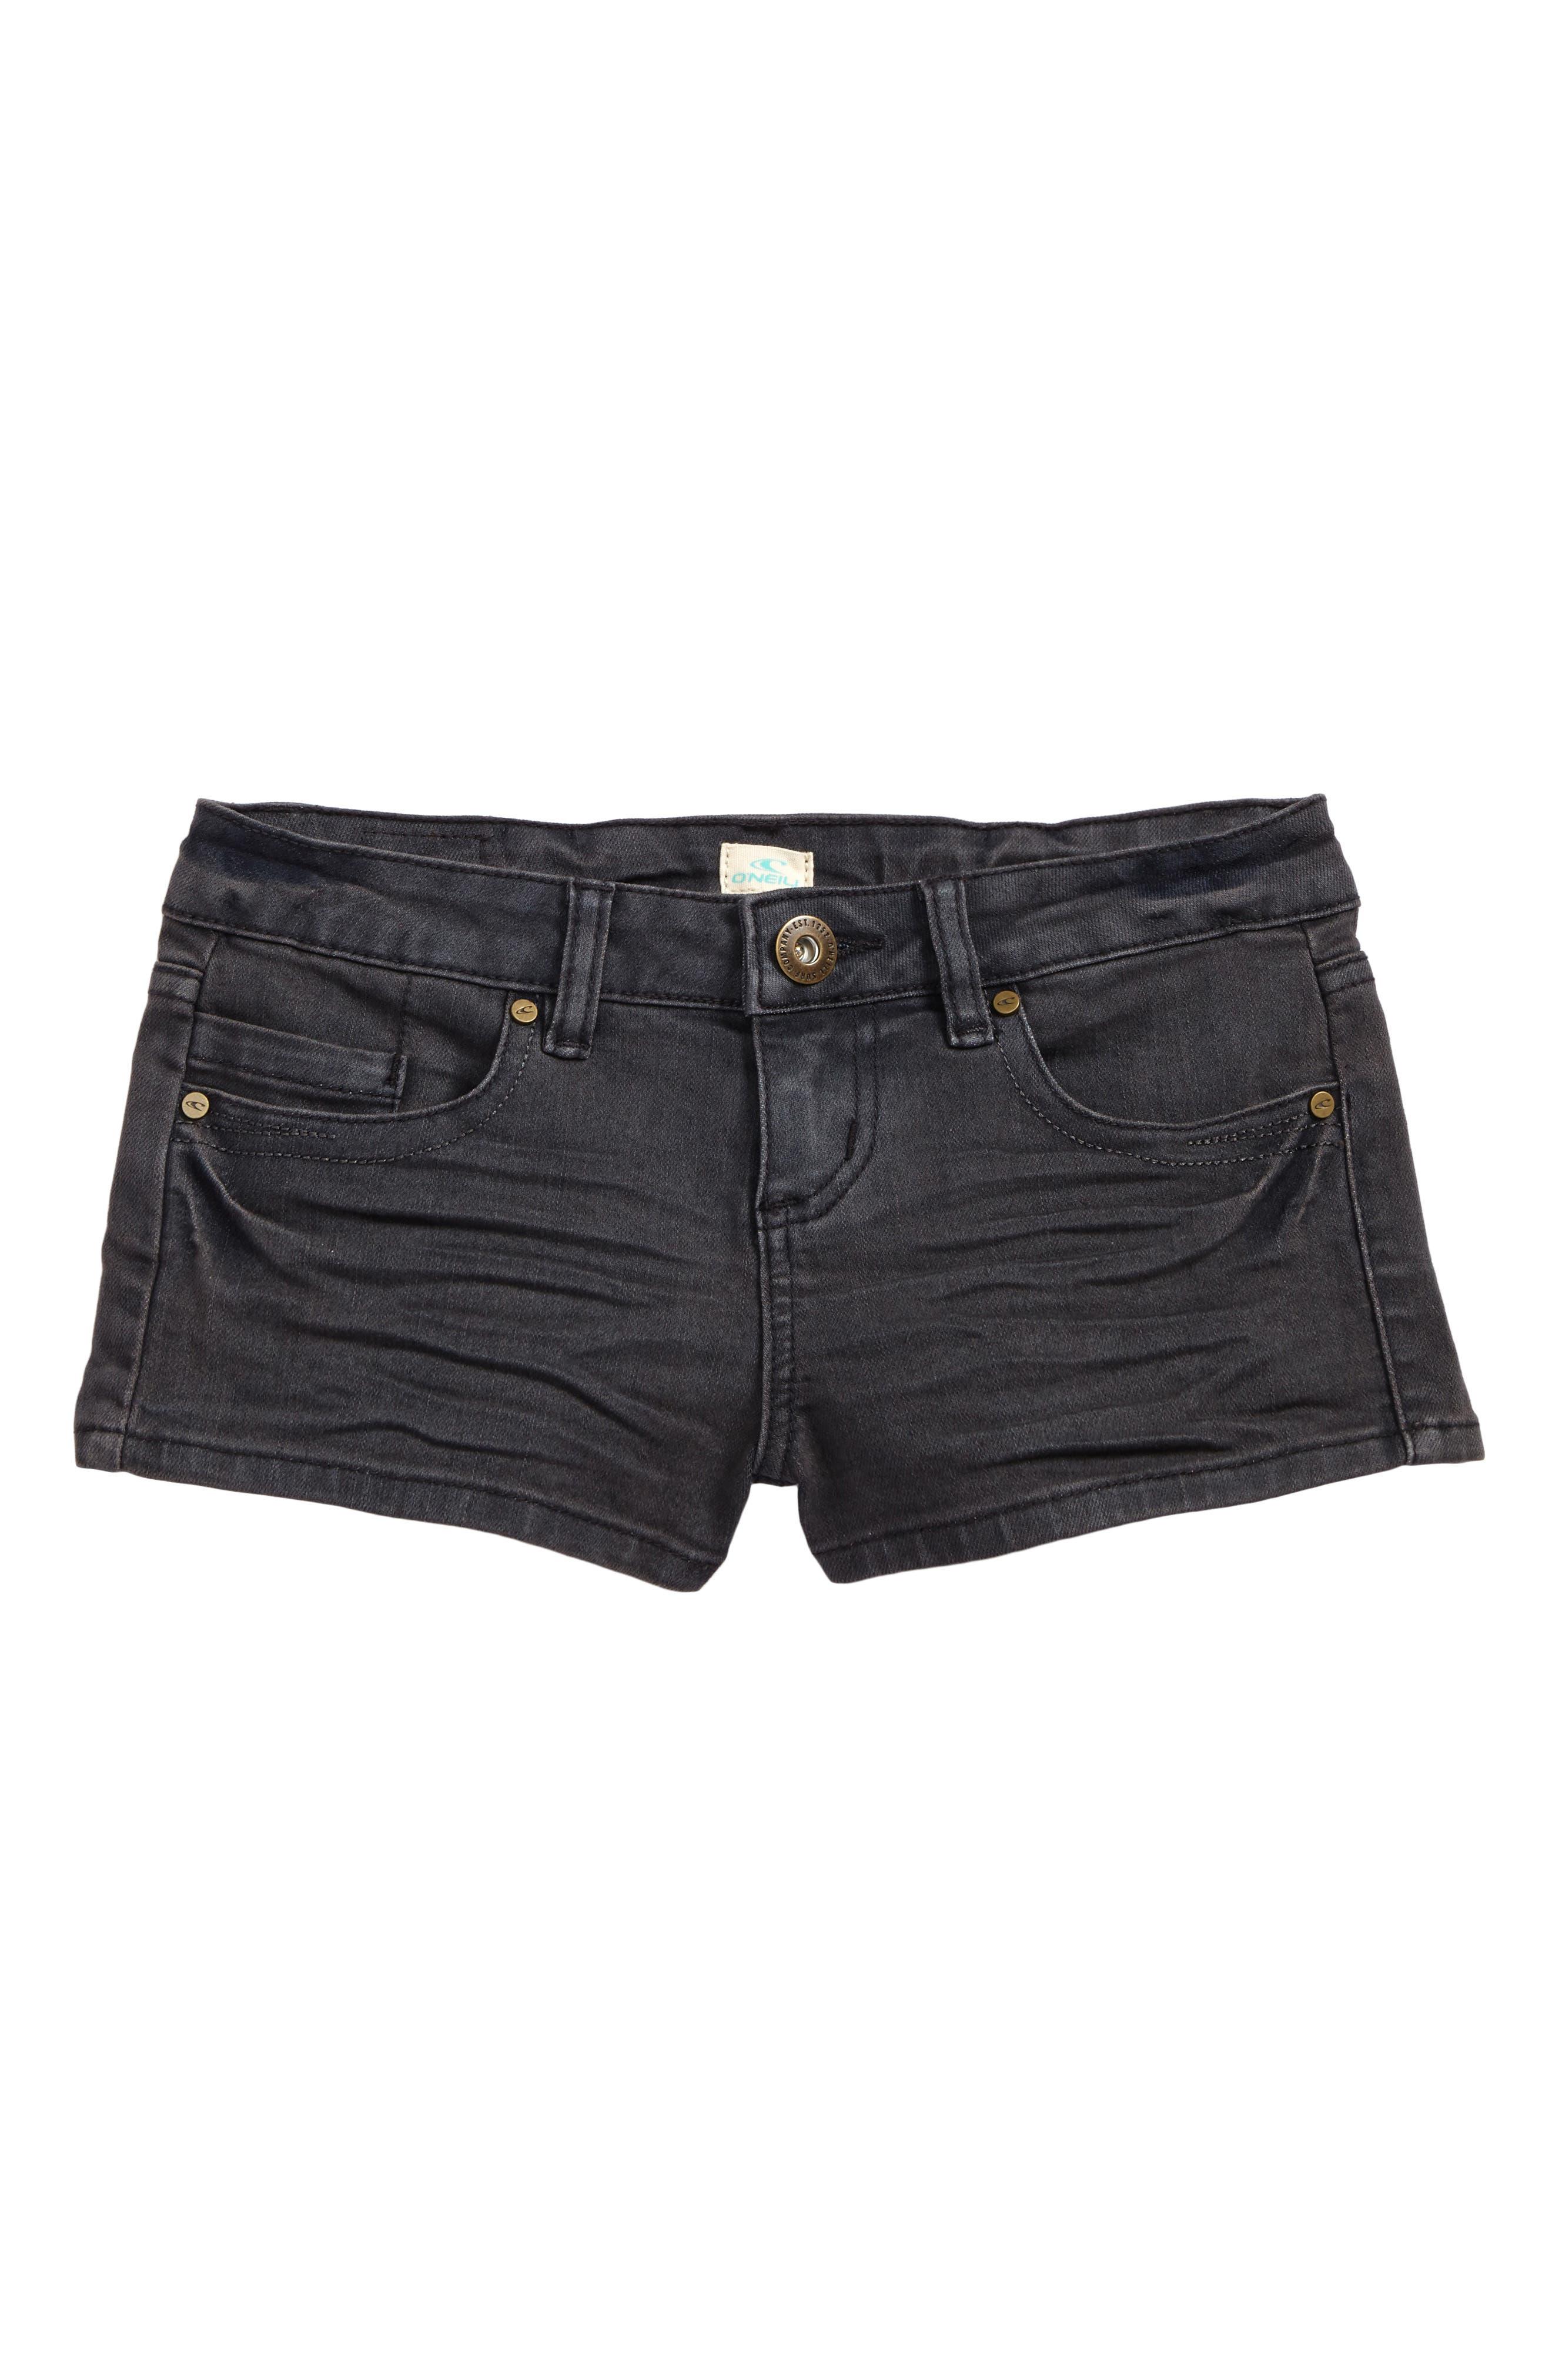 O'Neiil Waidley Denim Shorts,                             Main thumbnail 1, color,                             SLATE WASH - SLT